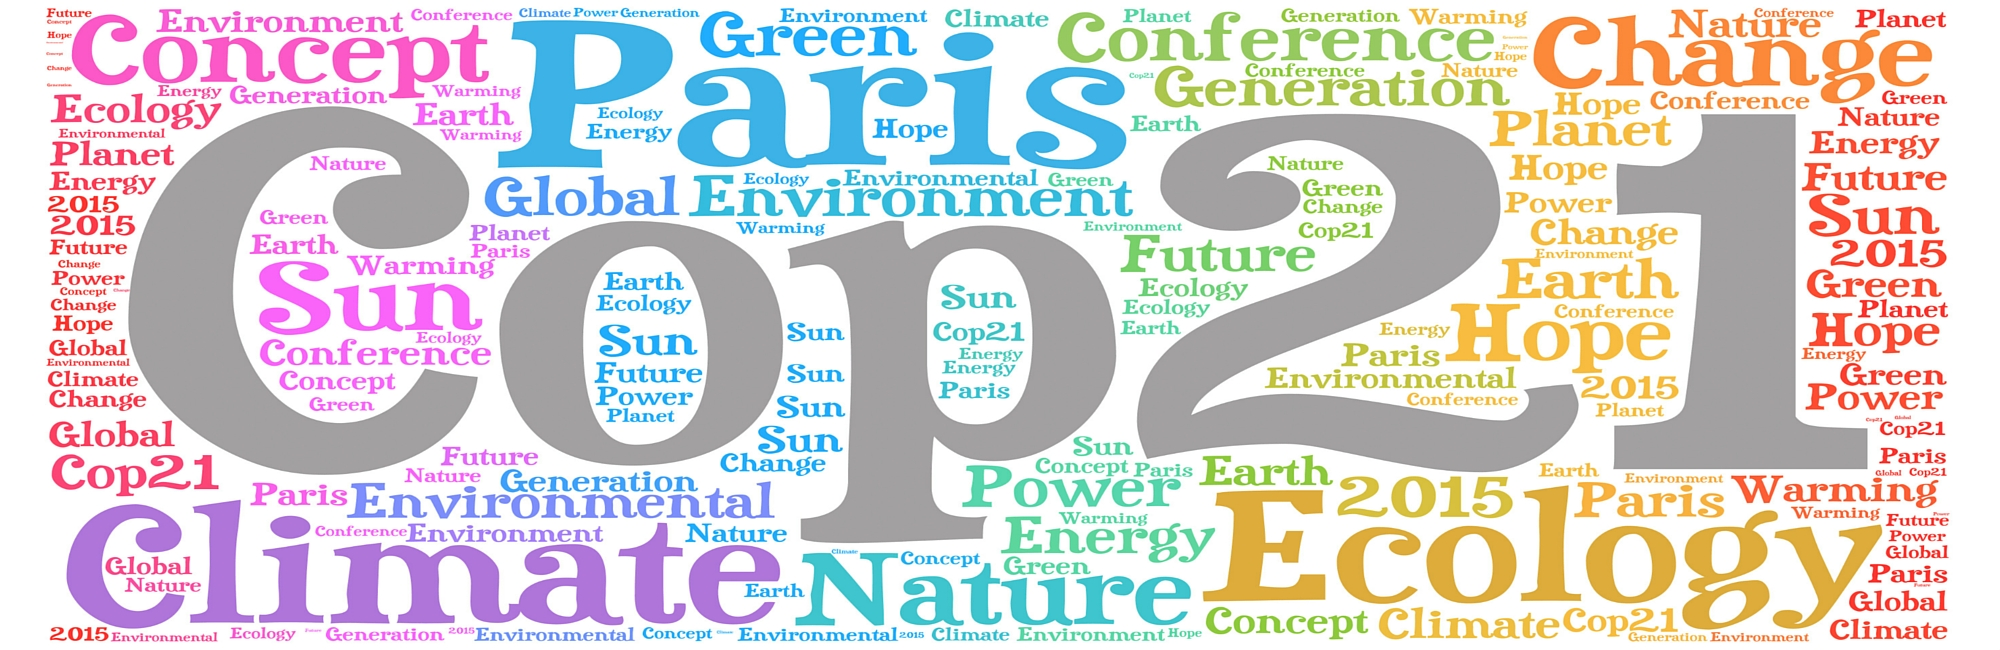 COP21 Ecuador